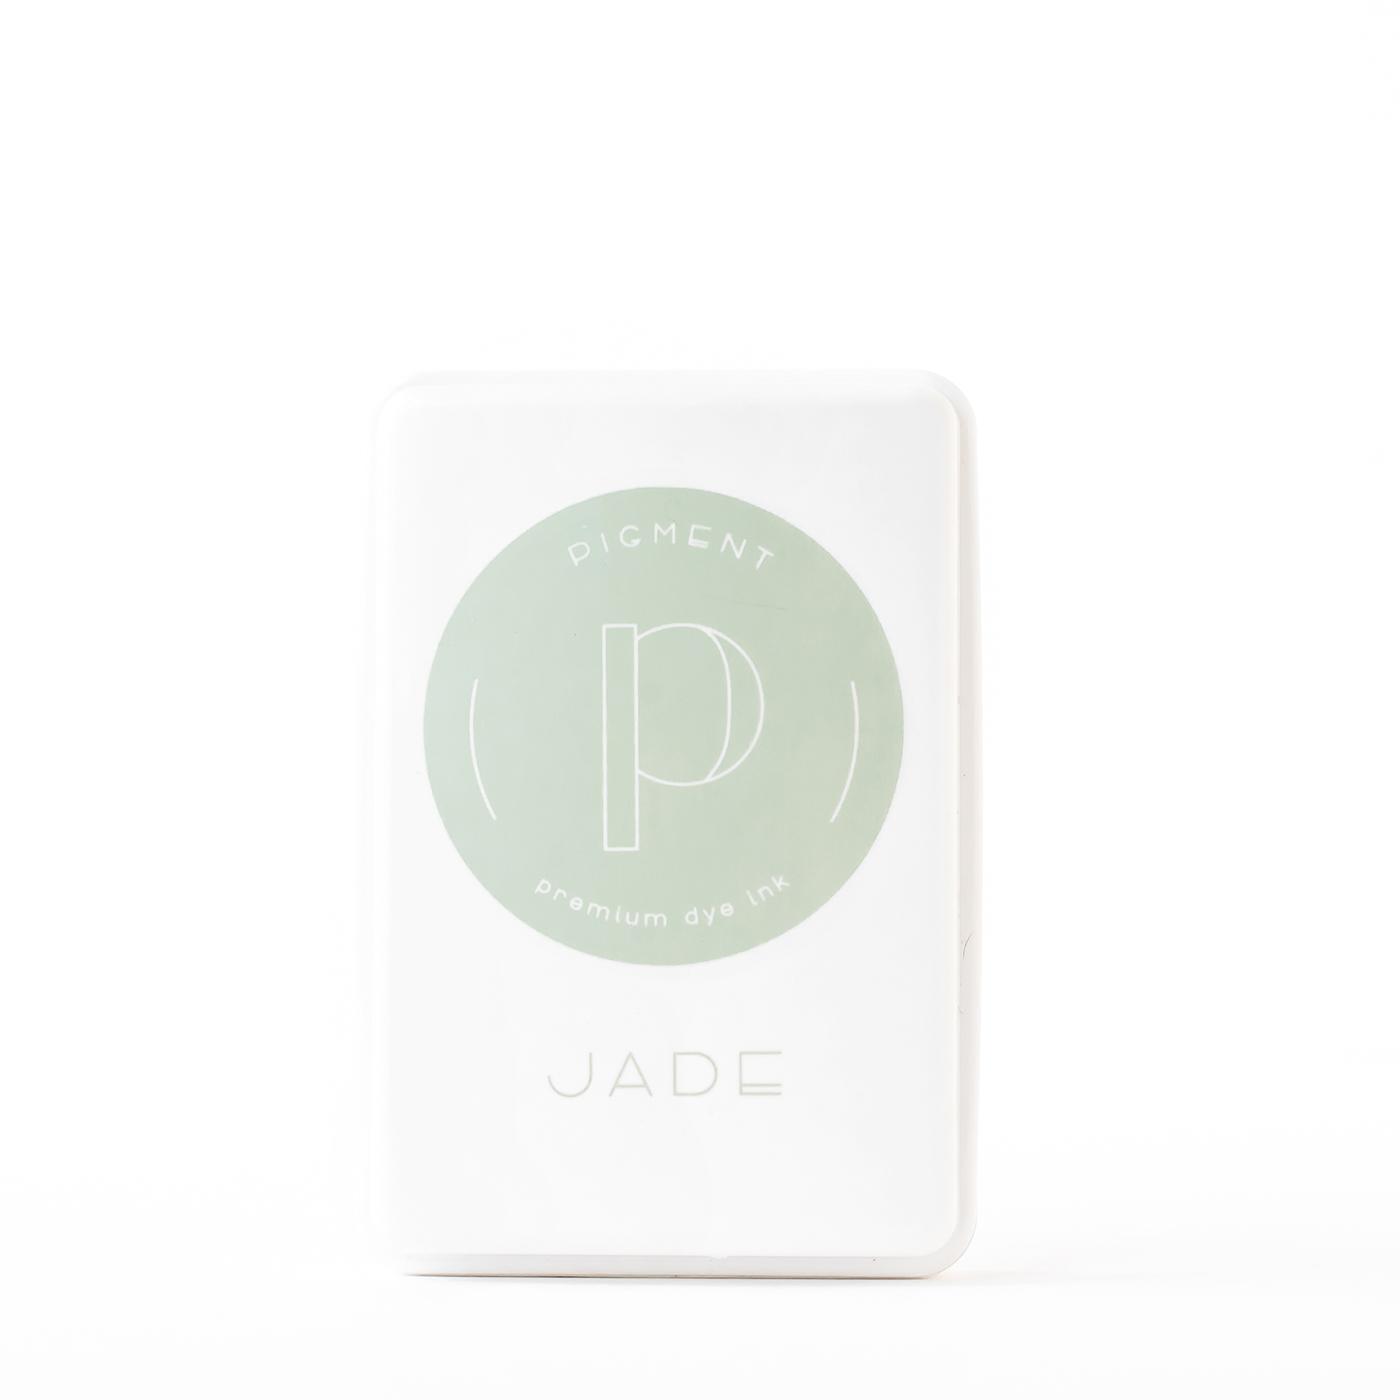 Pigment Jade Premium Dye Ink